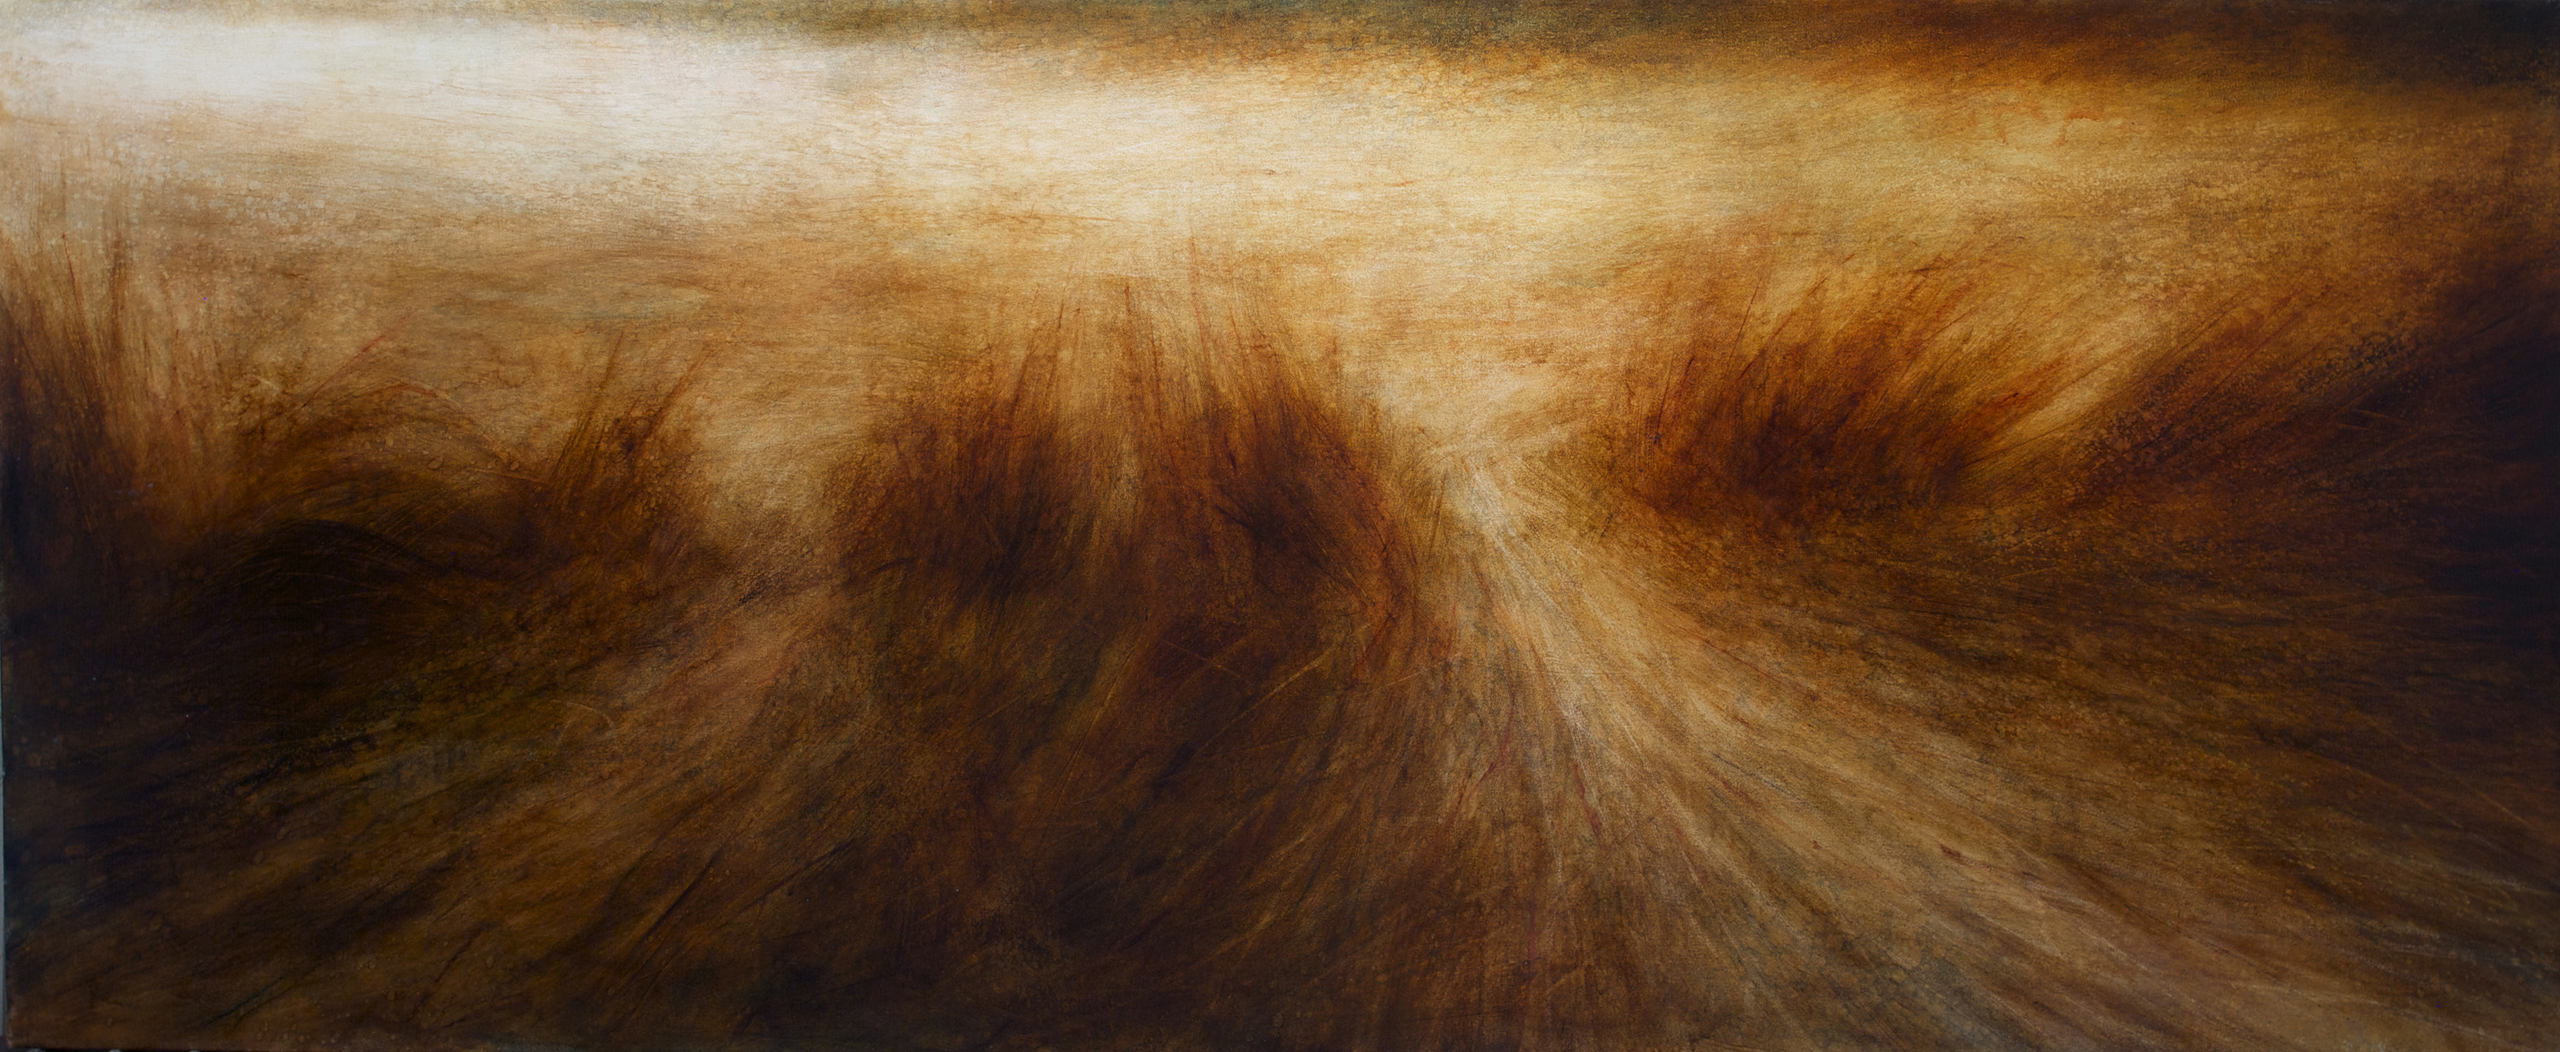 "Maya Kulenovic: GRASSLANDS / DOWNSTREAM, 2017, oil on canvas, 40"" X 94"" (102cm X 238cm). 'Land' Series; 'Grasslands' Series"